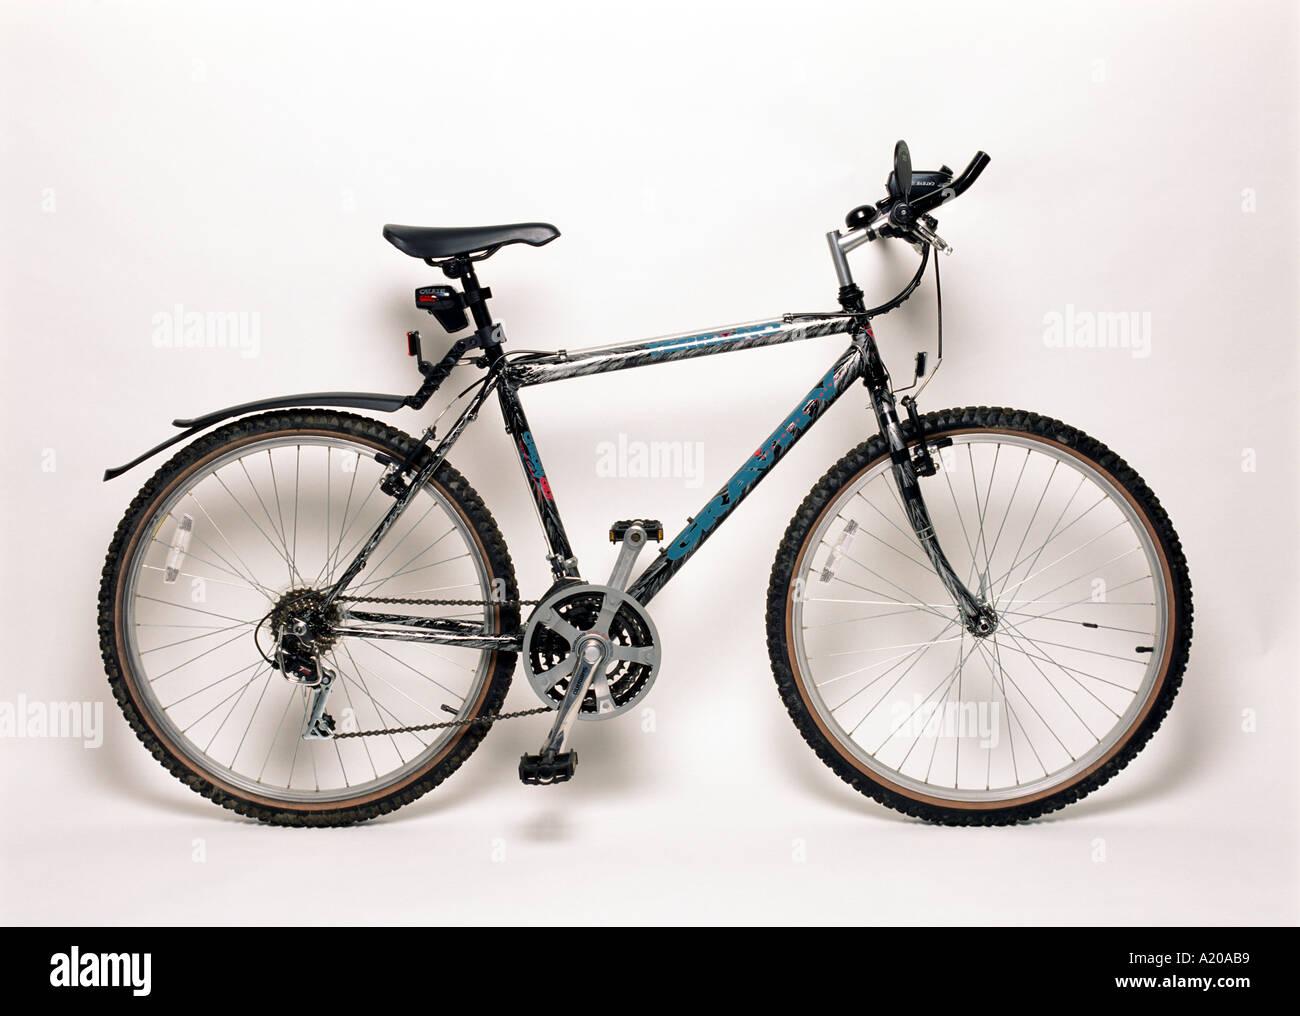 a mountain bike against plain white background - Stock Image